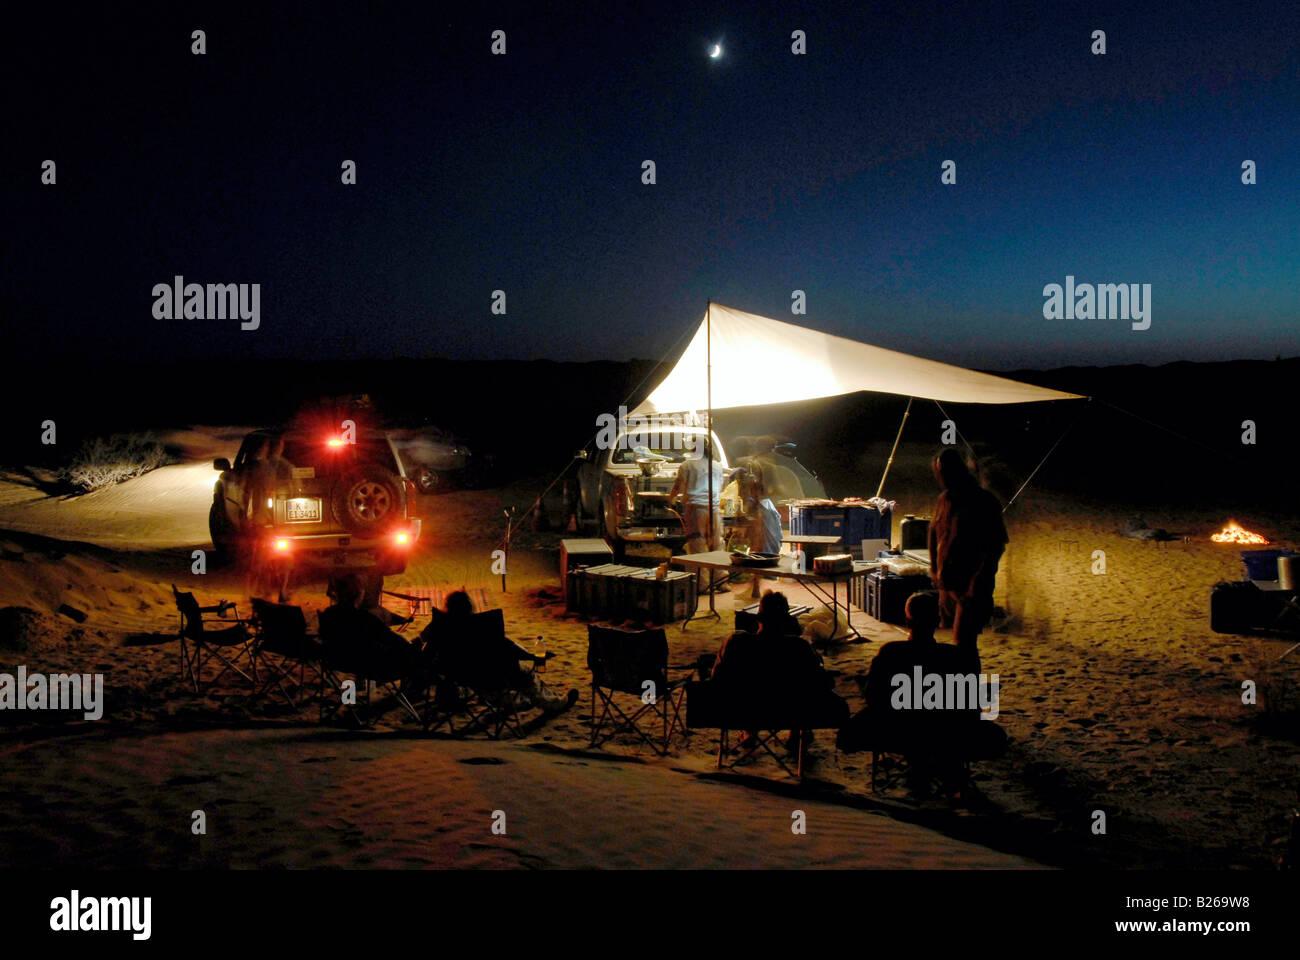 A group of people camping in the desert, Offroad 4x4 Sahara Desert Tour, Bebel Tembain area, Sahara, Tunisia, Africa, - Stock Image